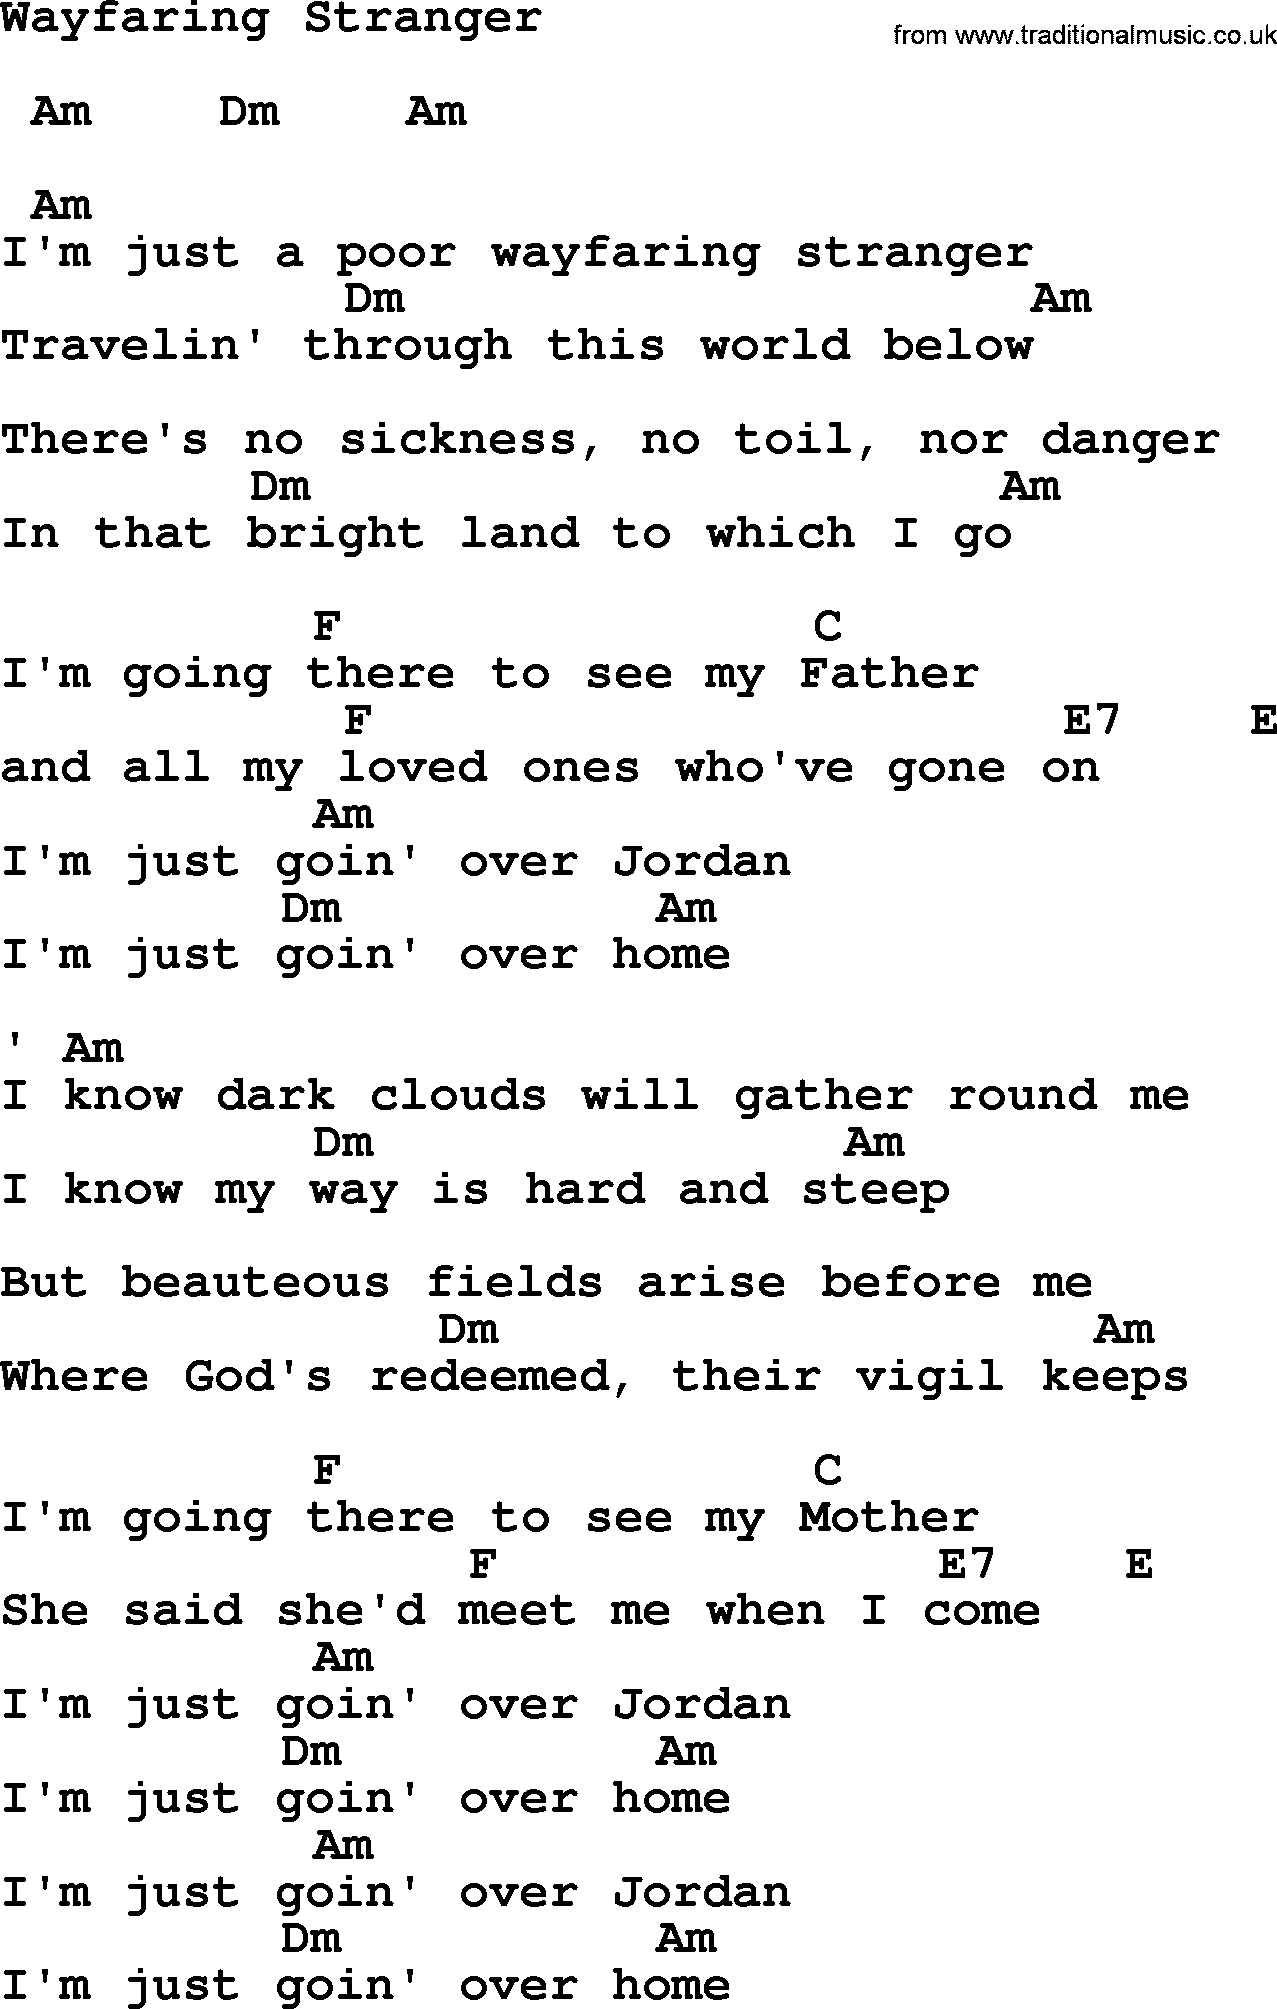 Johnny Cash song Wayfaring Stranger, lyrics and chords : johnny cash : Pinterest : Songs, Lyrics ...